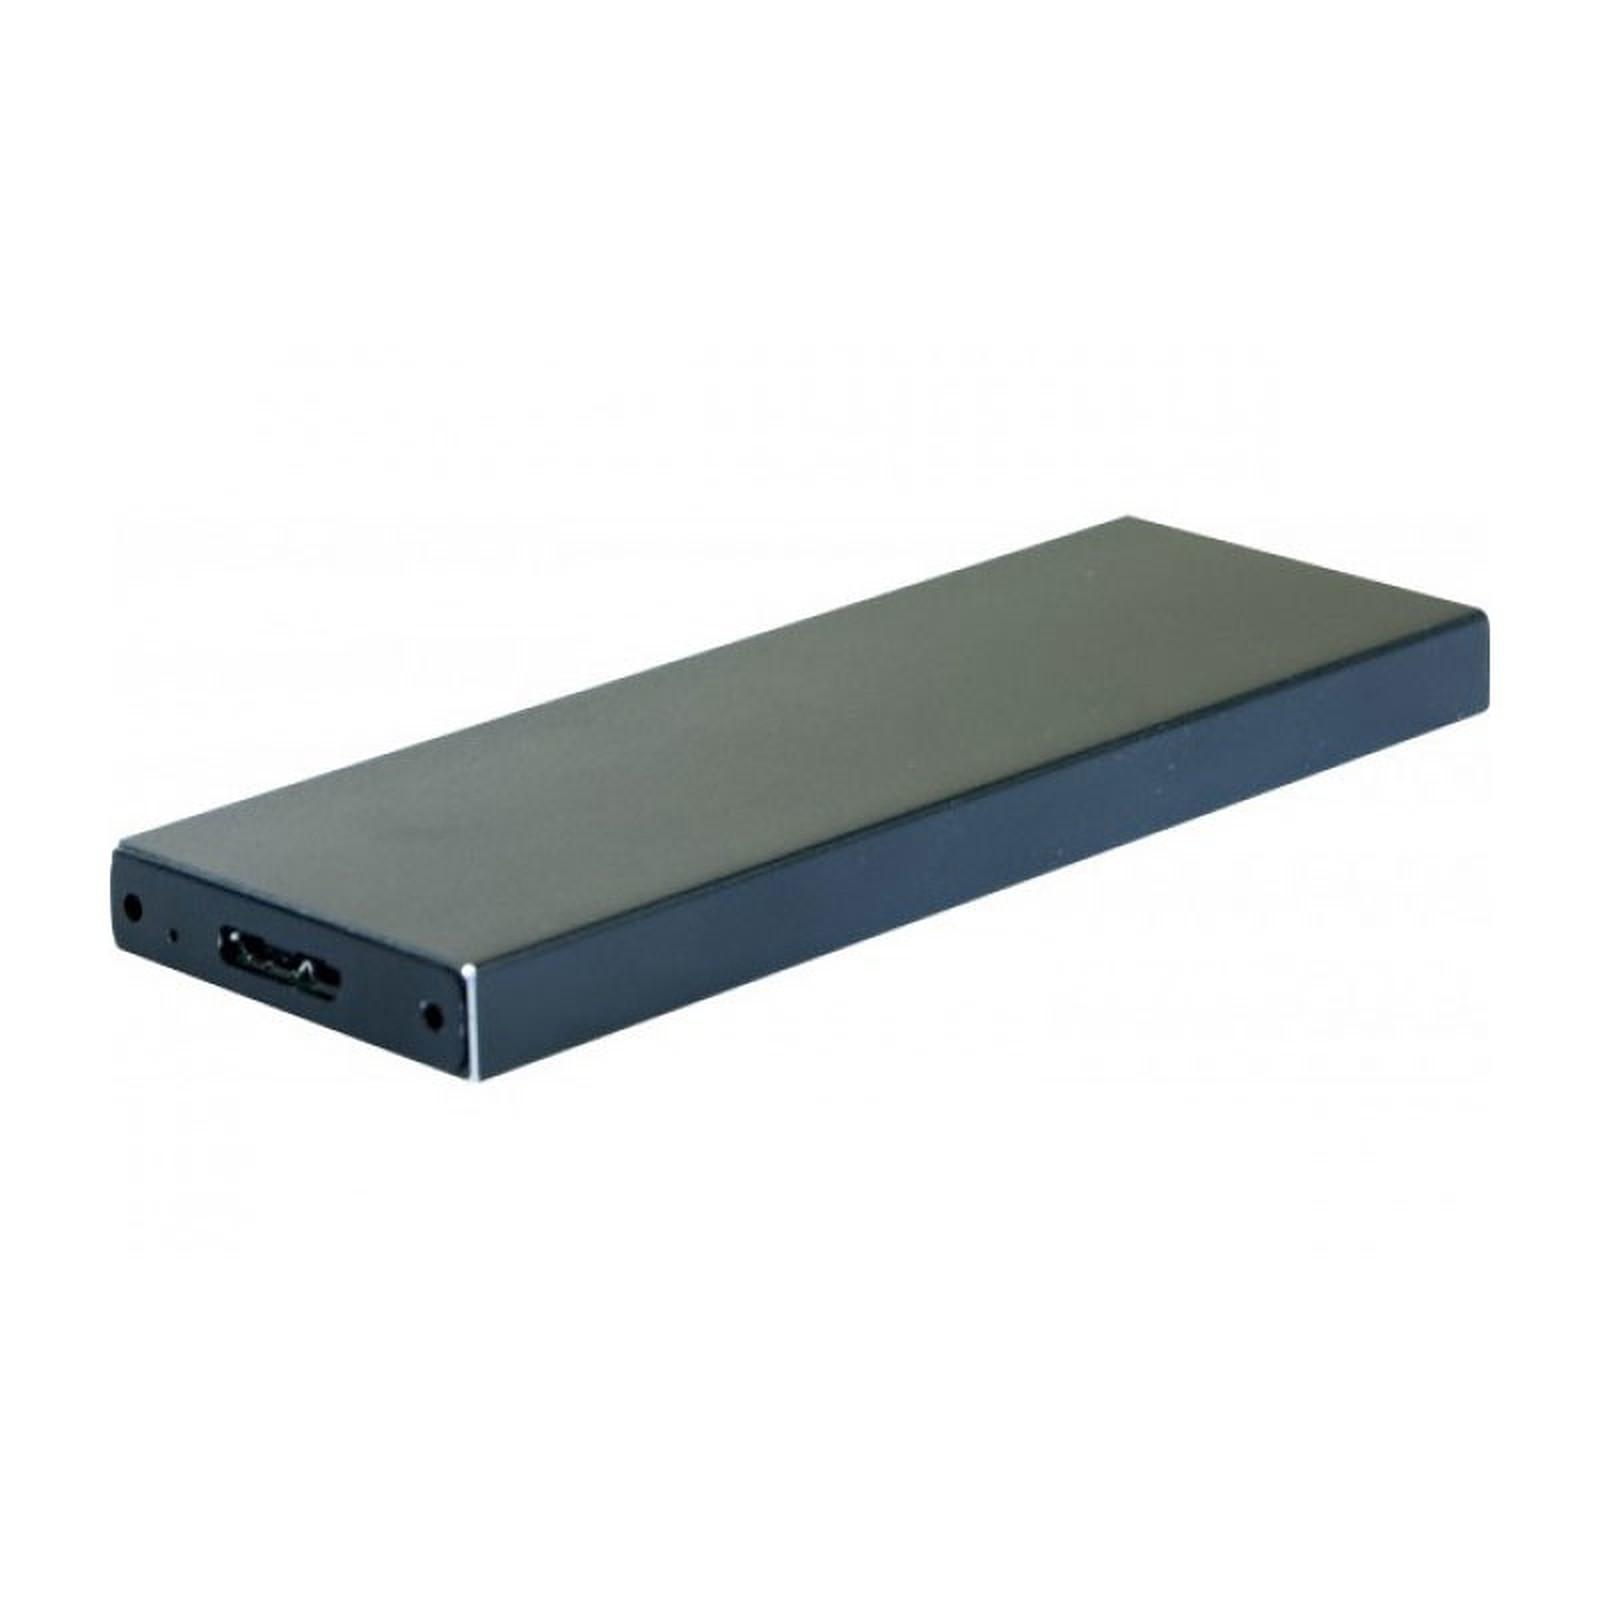 Carcasa USB 3.0 externa SSD SATA M.2